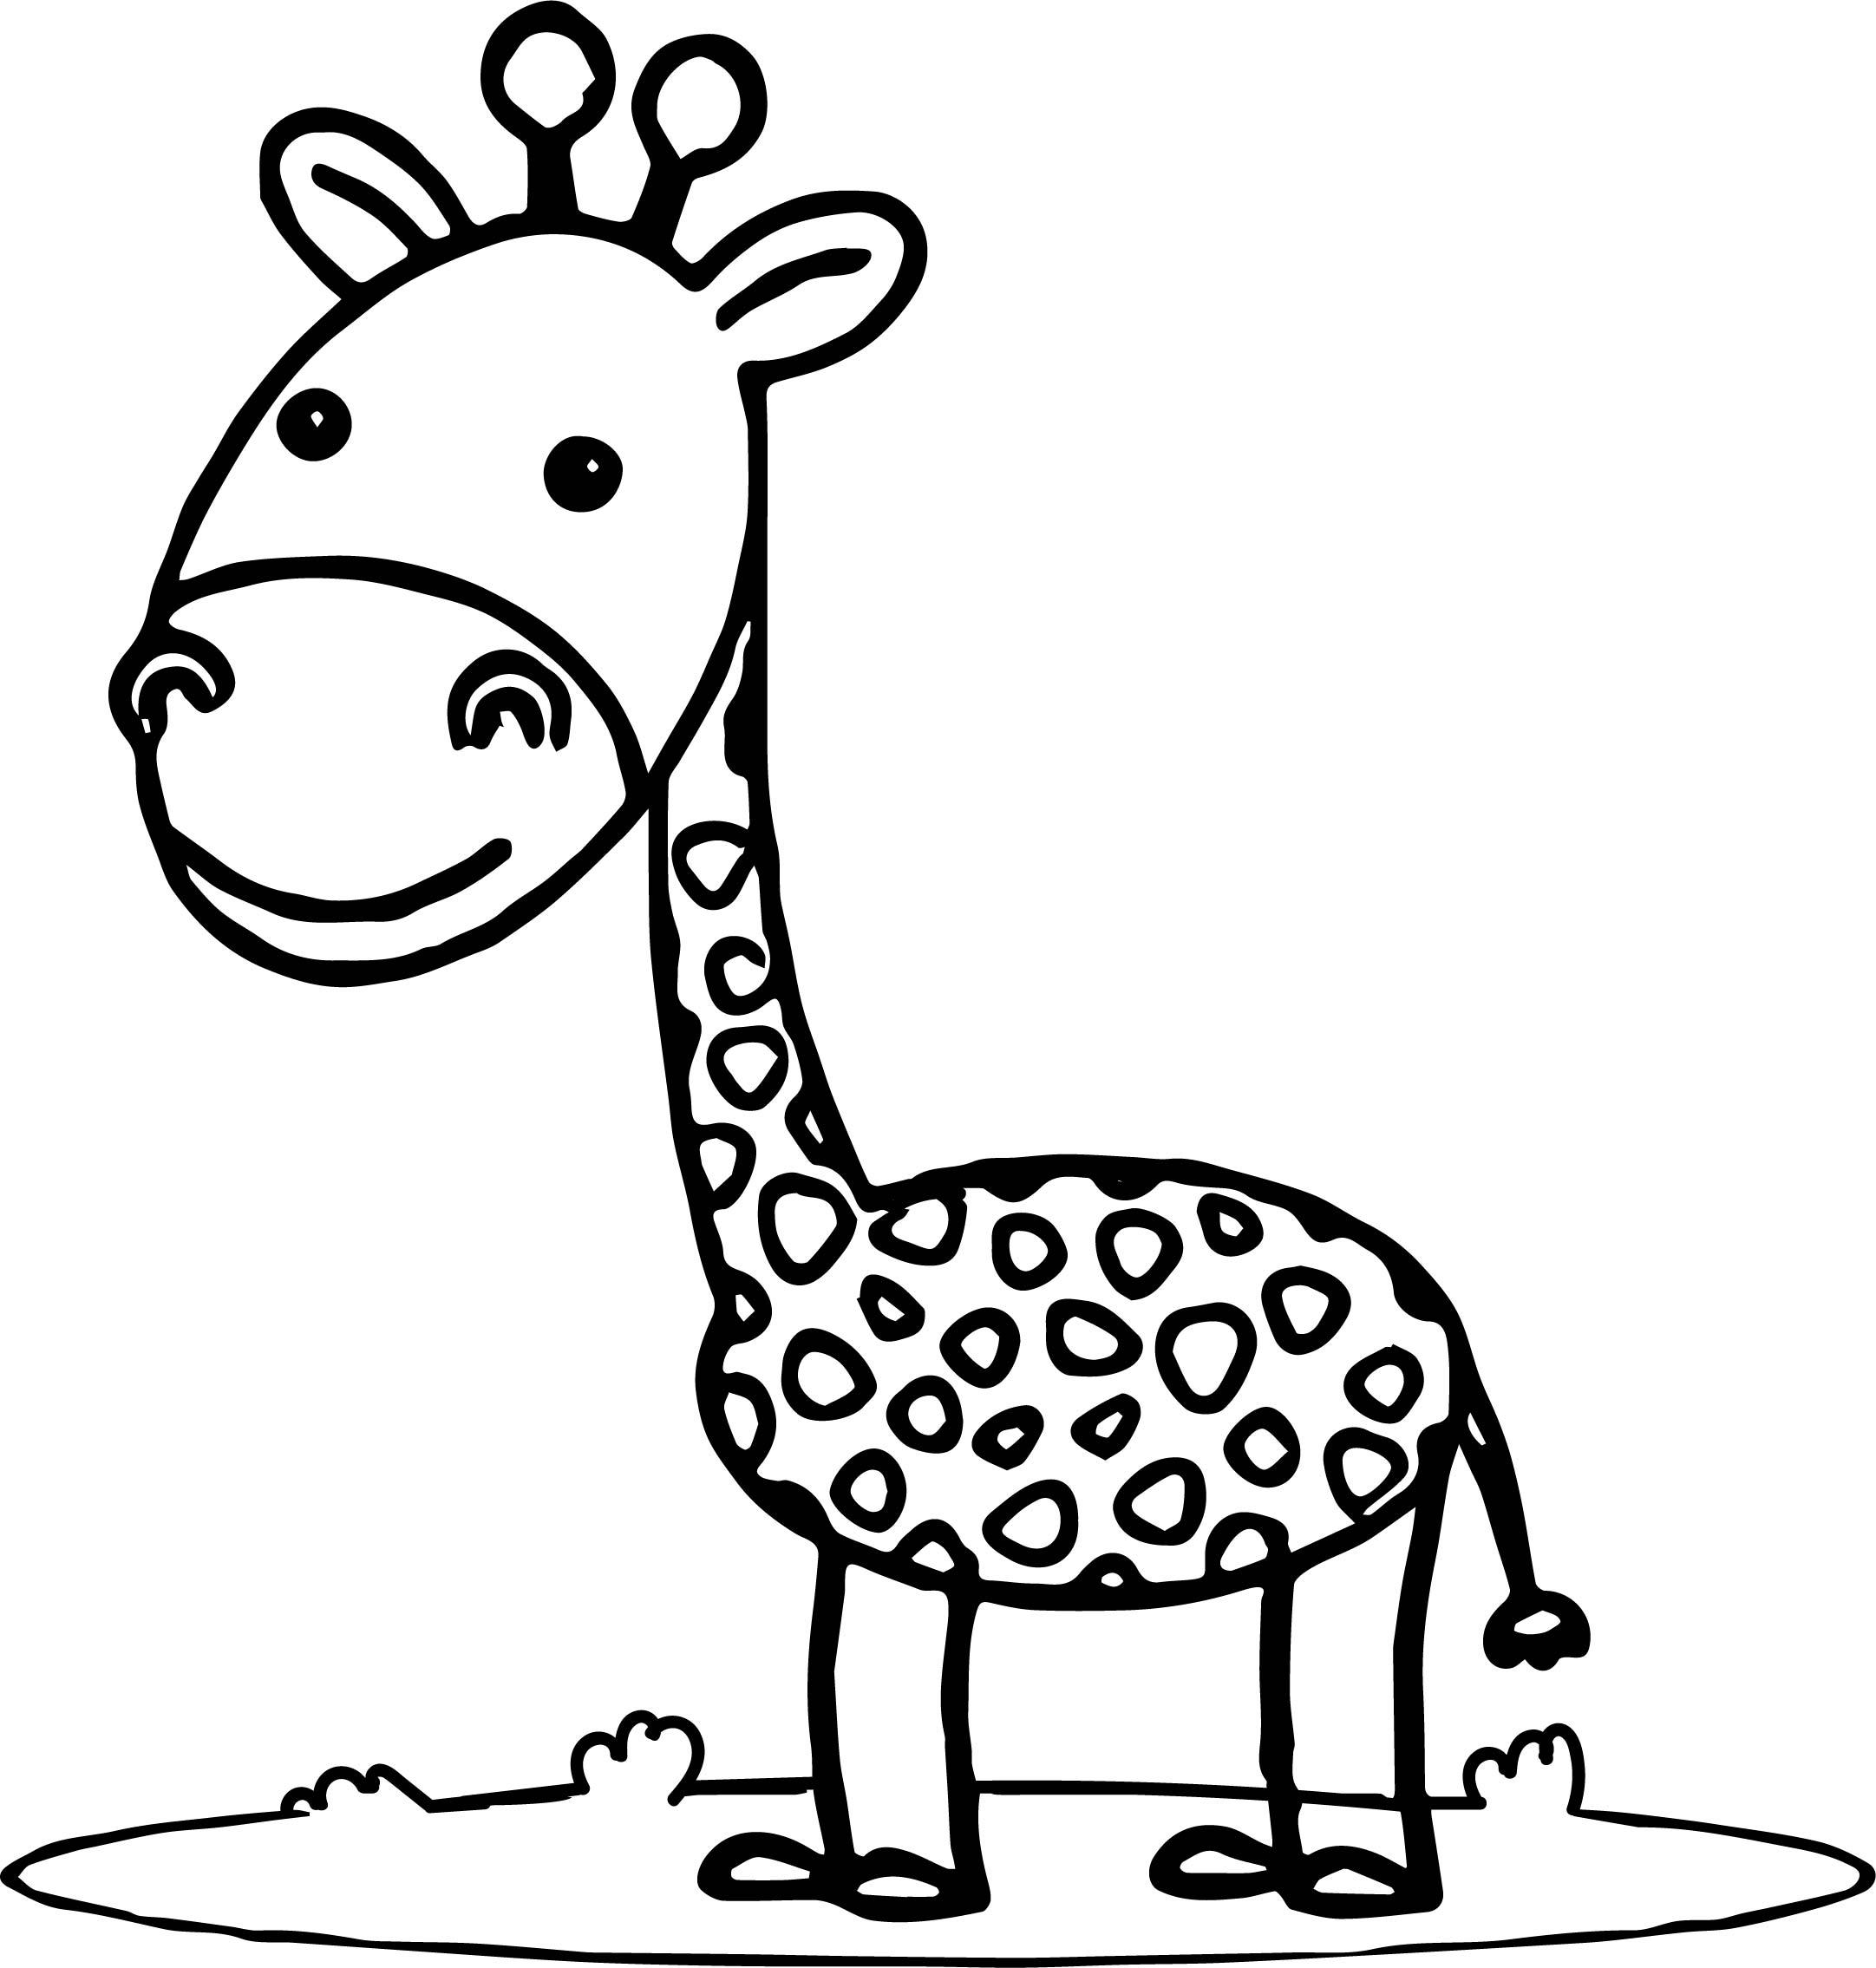 One Giraffe Coloring Page Wecoloringpage Com